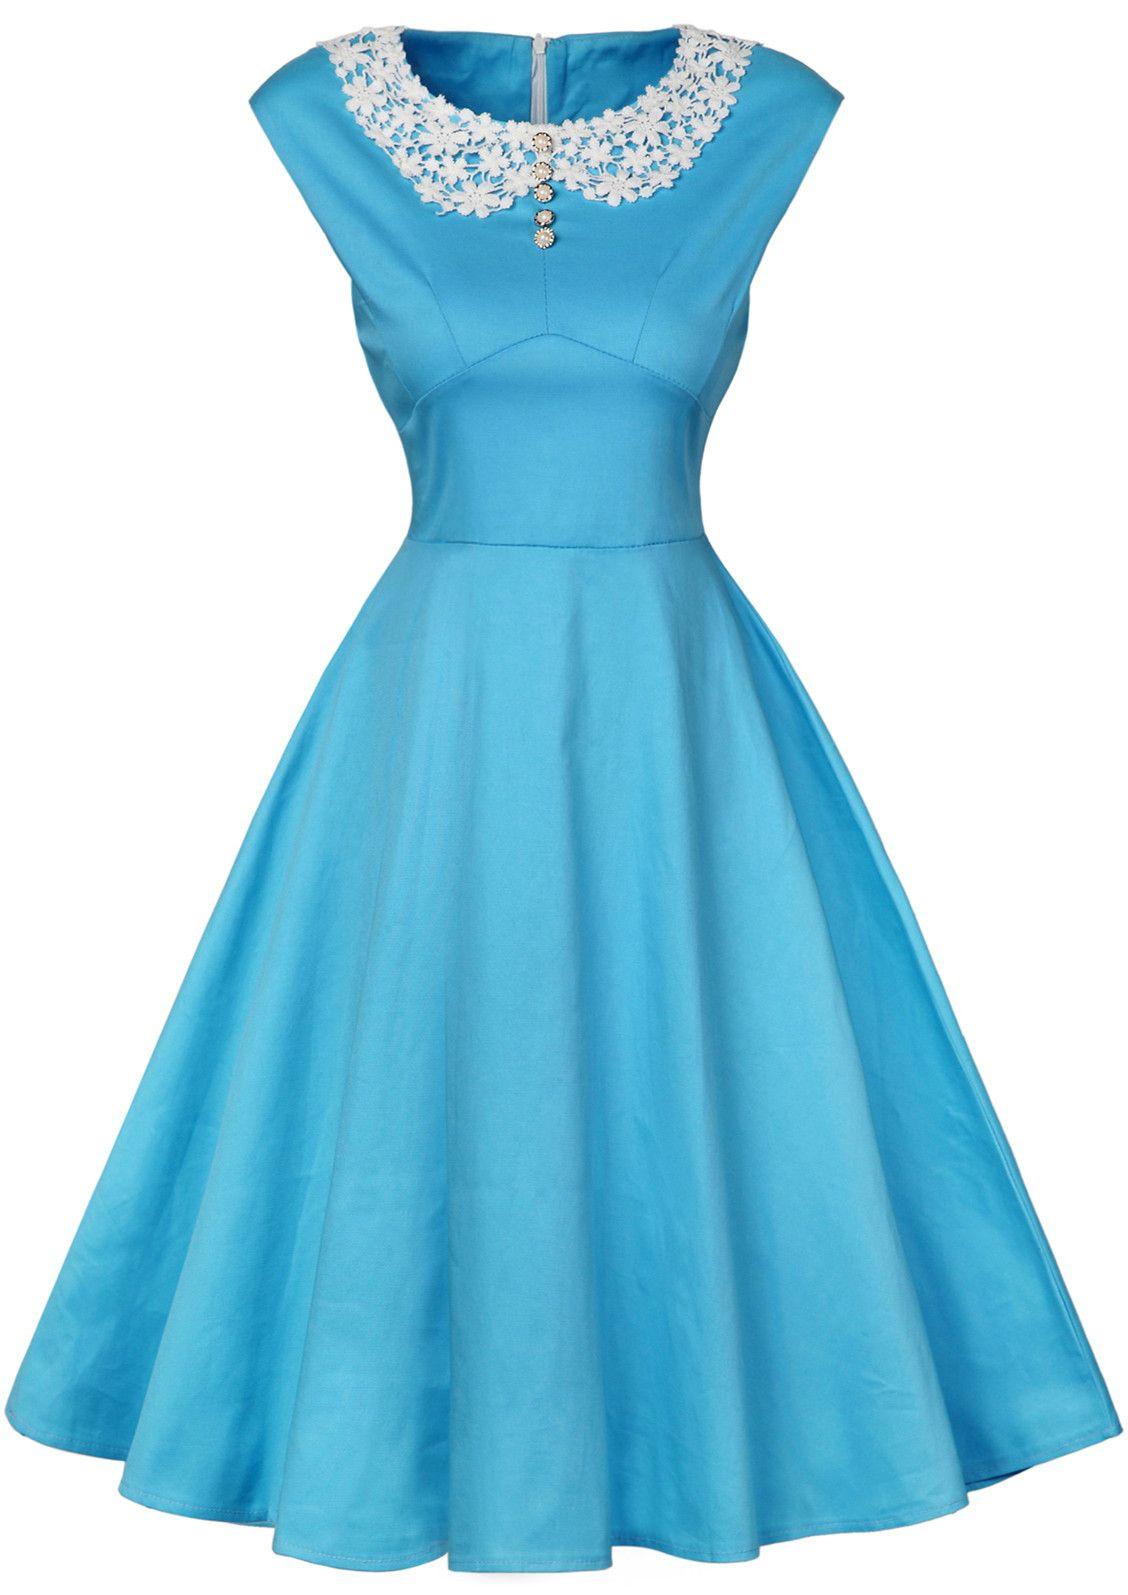 $23.85 Vintage High Waist Lace Insert Buttoned Dress   Pretty ...